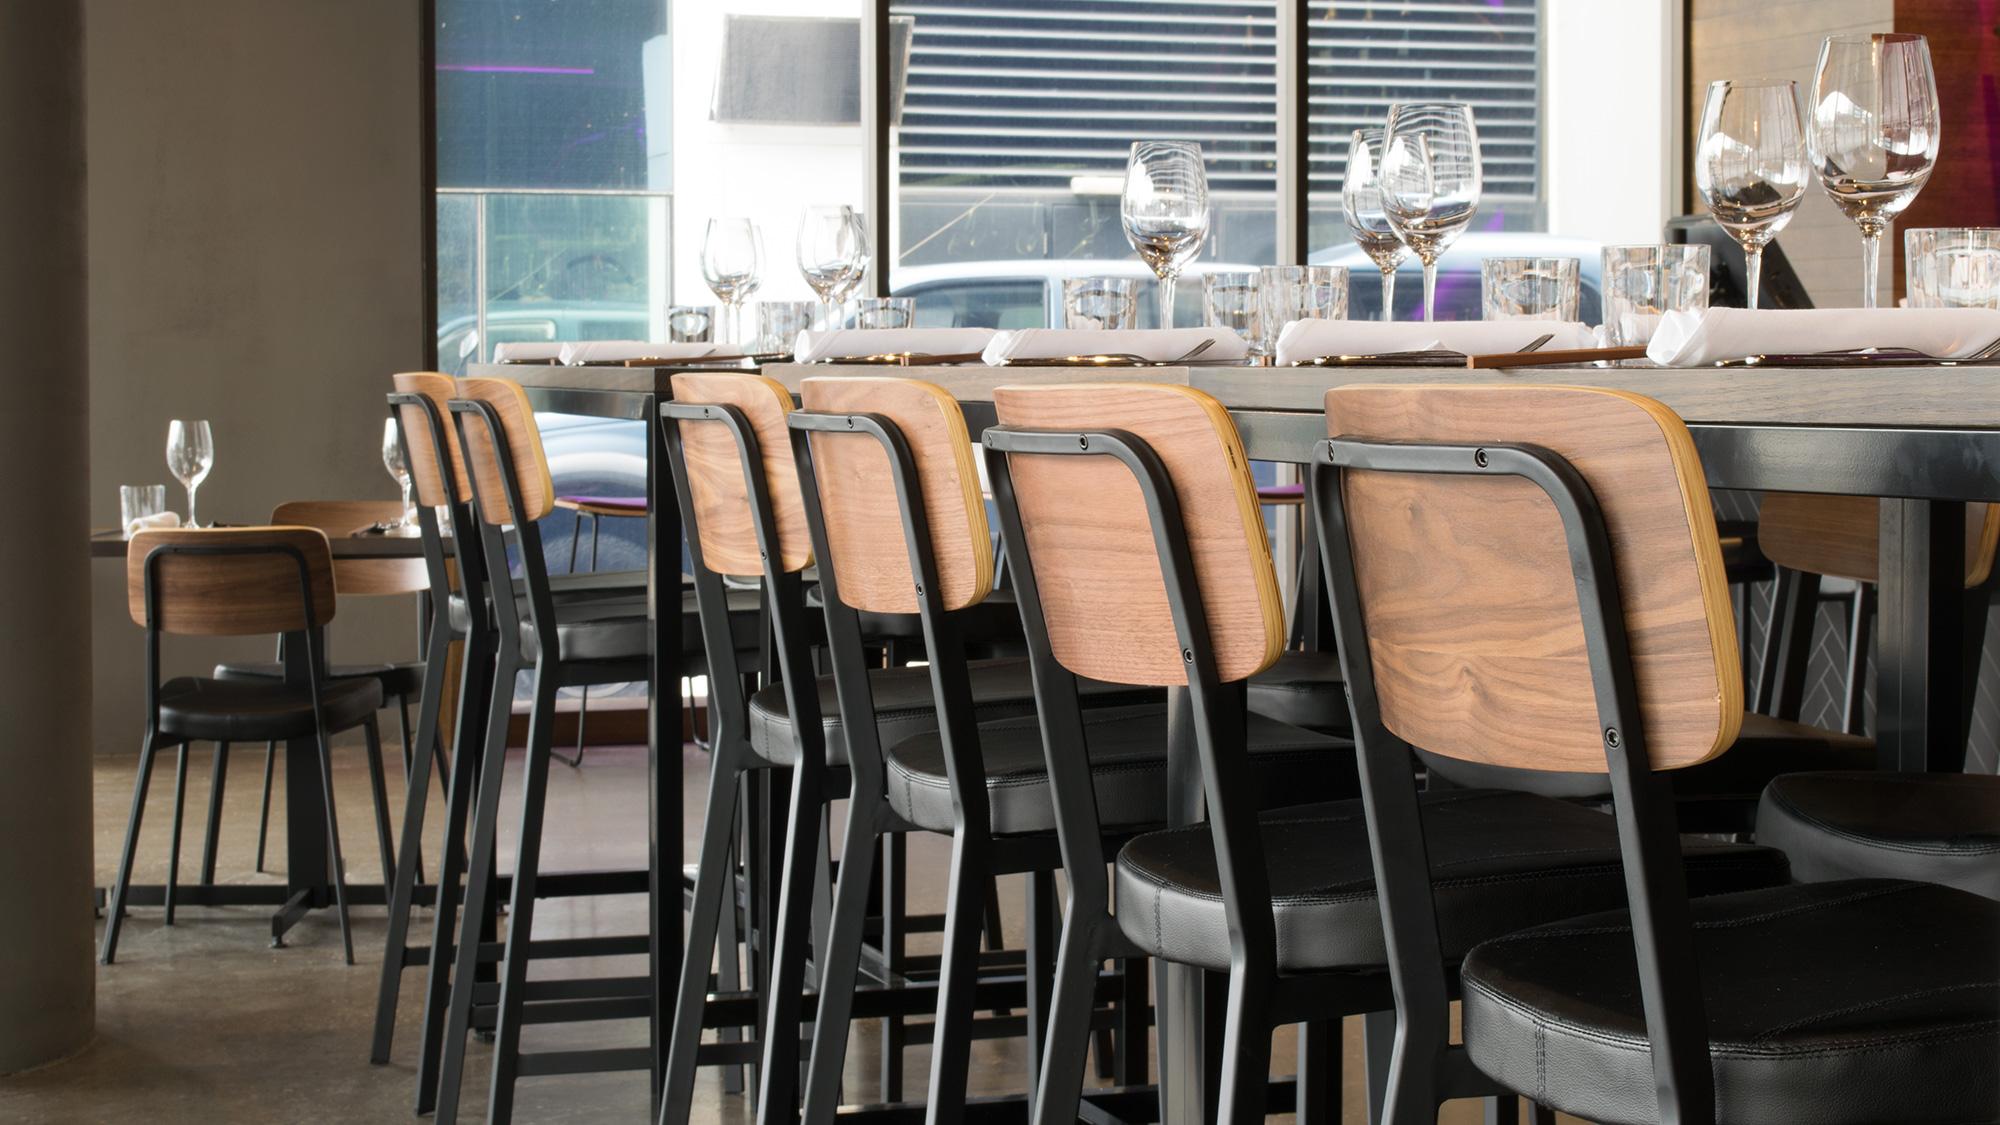 Mimasu Restaurant Adelaide - Caprice Bar Stools